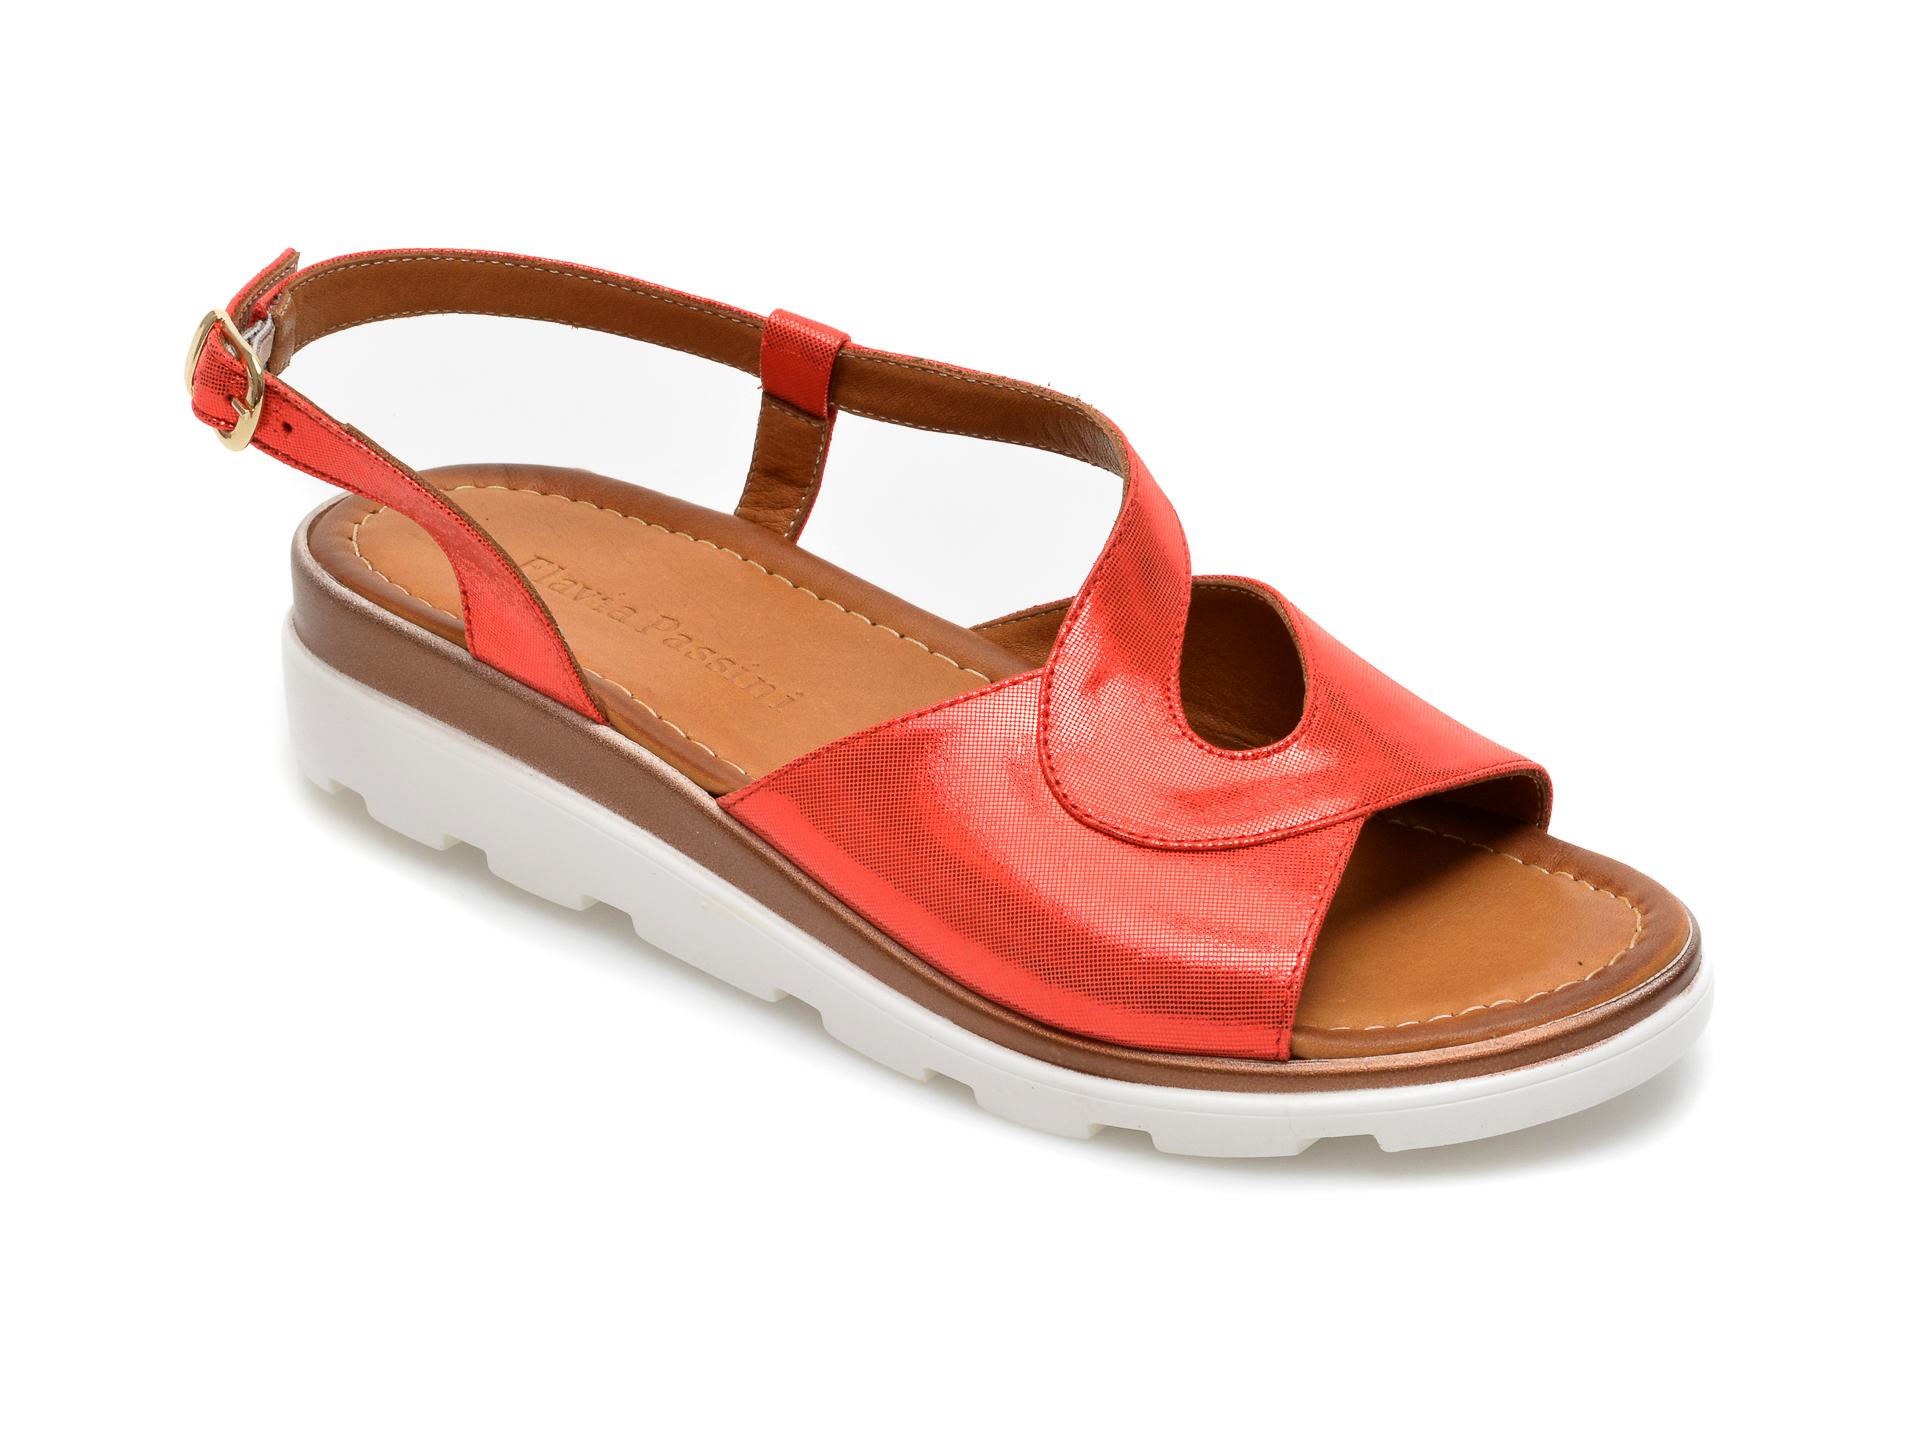 Sandale FLAVIA PASSINI rosii, 2049, din piele naturala imagine otter.ro 2021